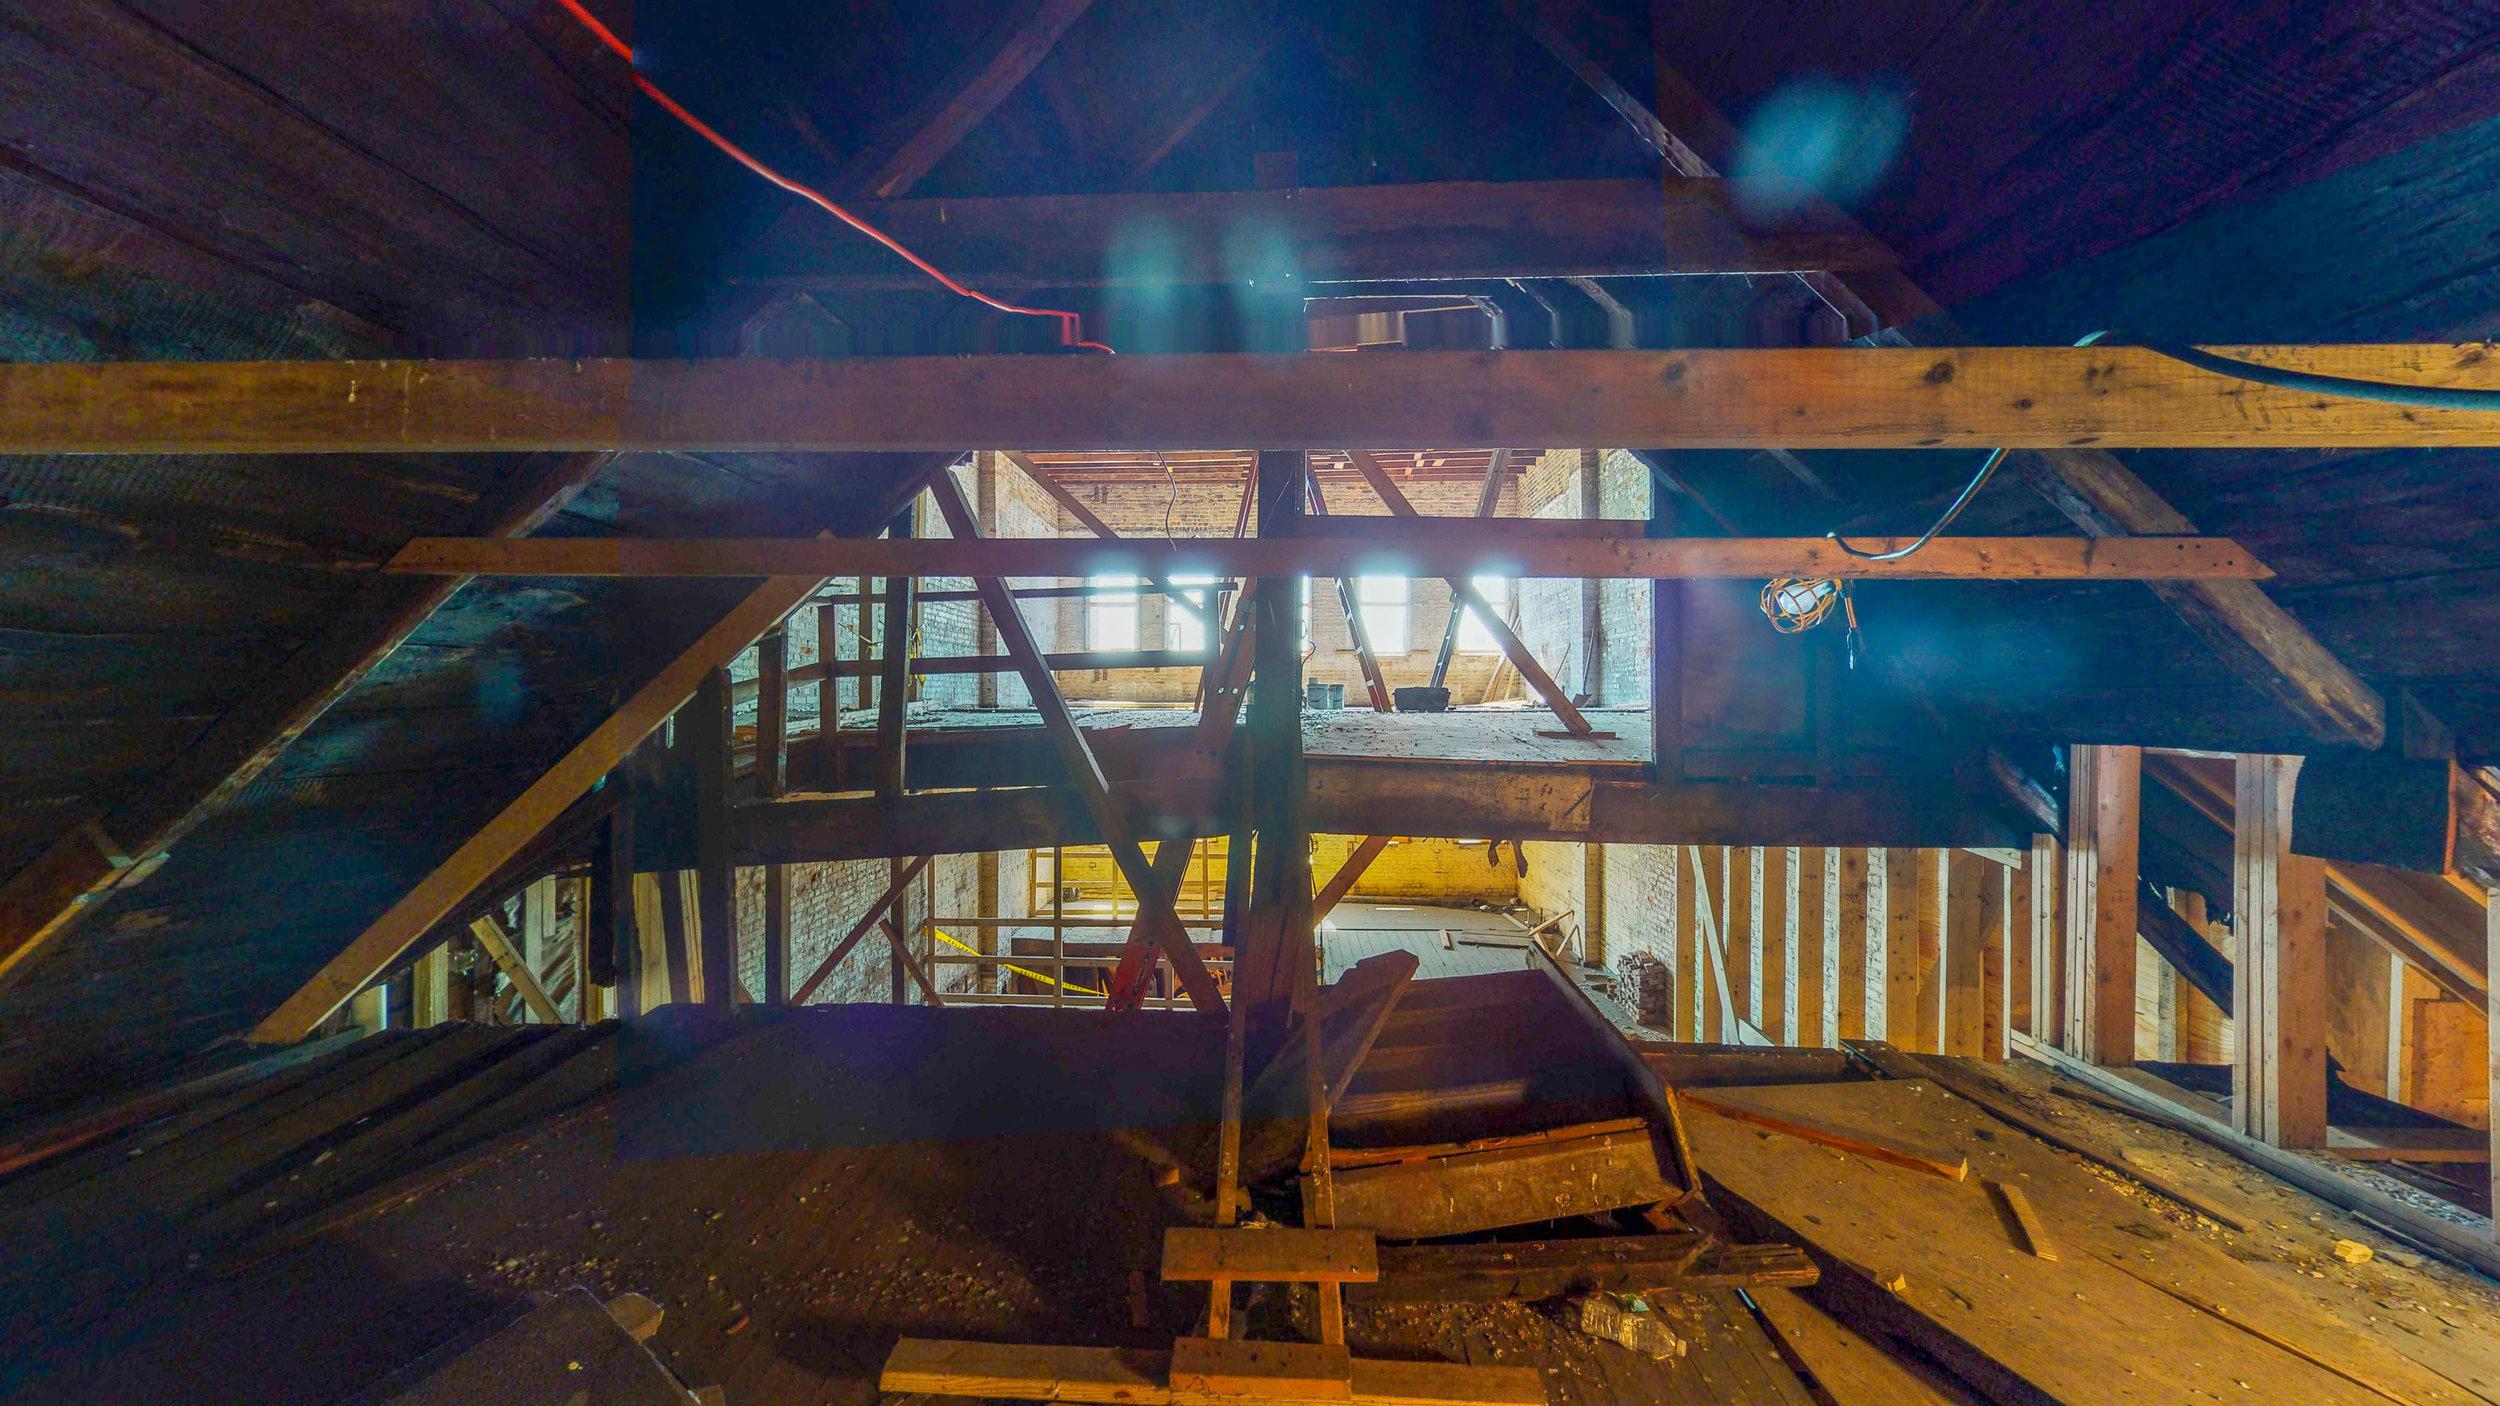 The-Van-Ostrande-Radliff-House-at-48-Hudson-08292019_131516.jpg